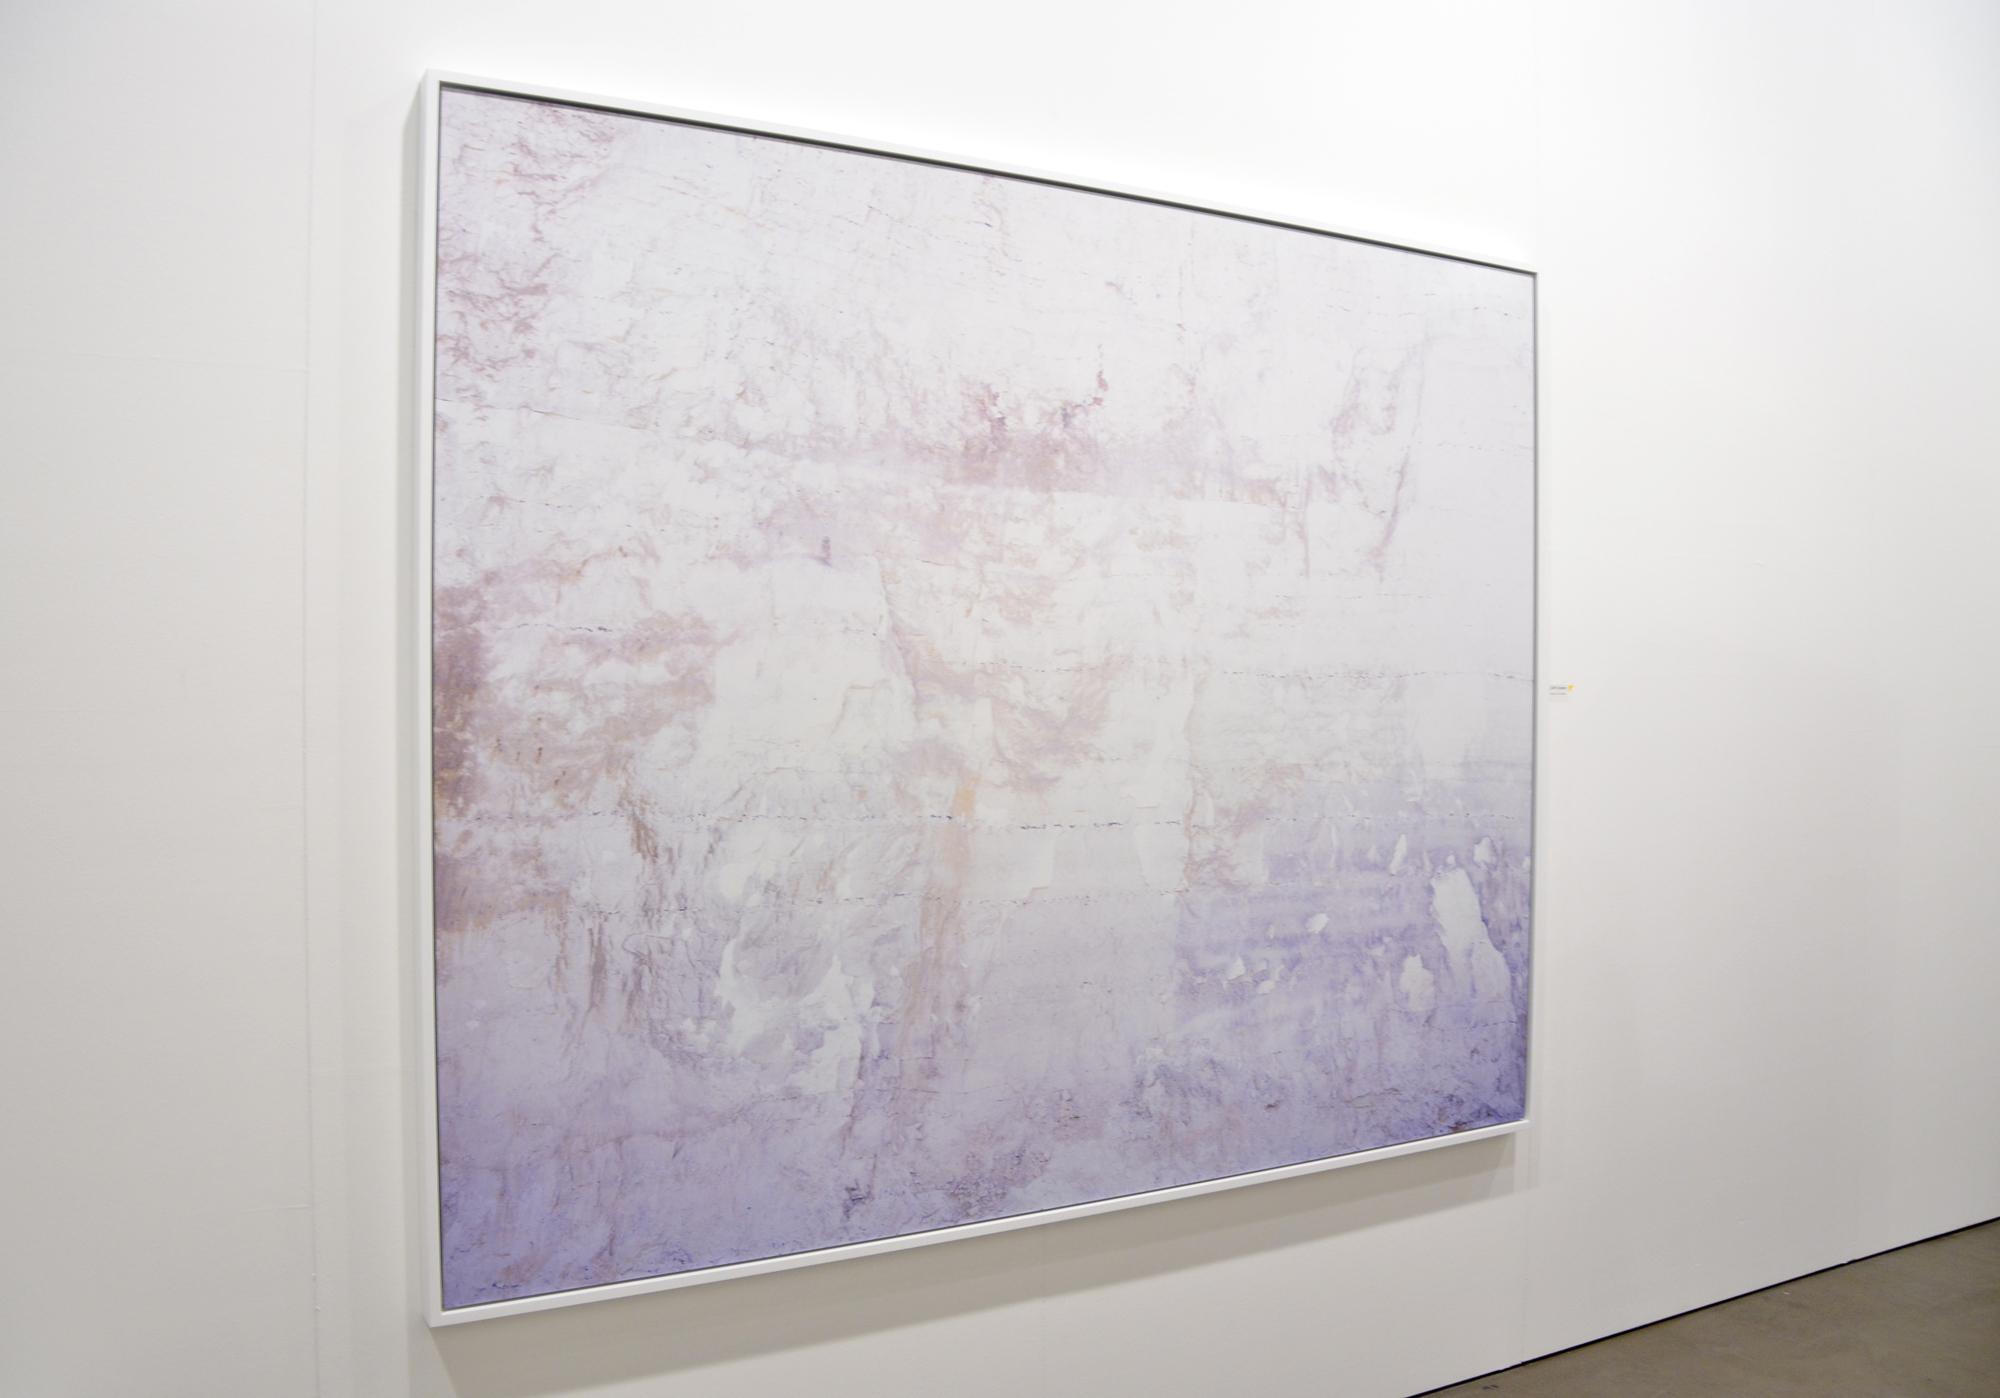 Misha de Ridder, Galerie Juliètte Jongma